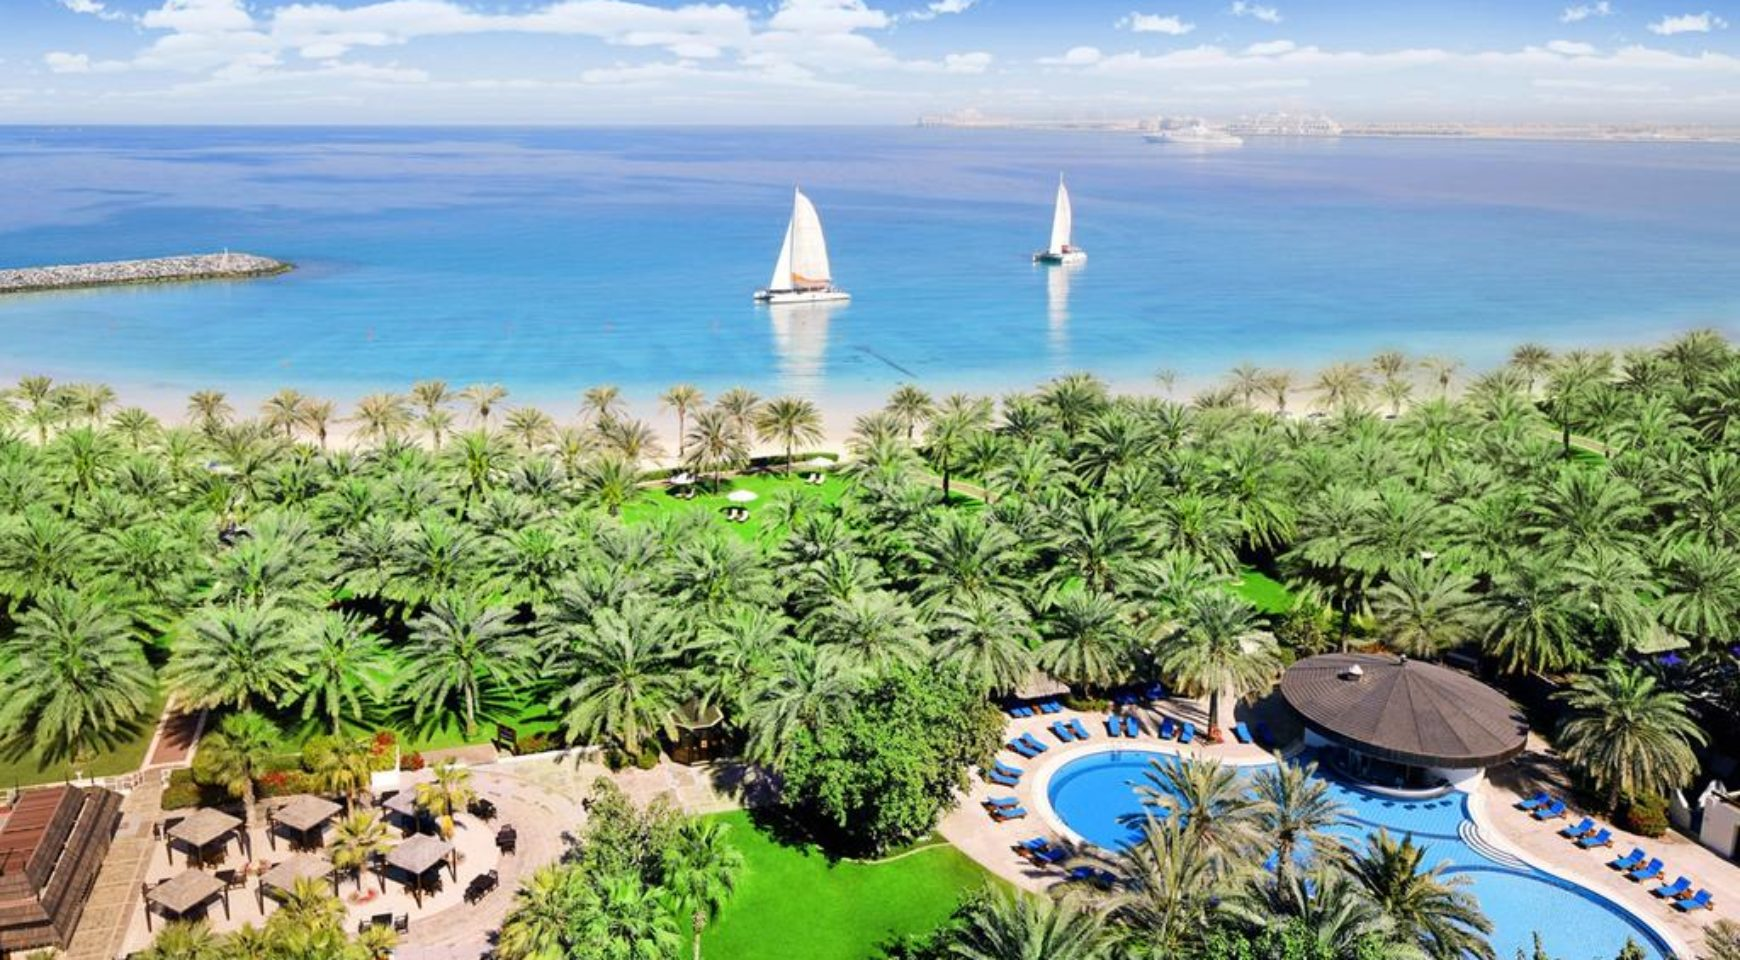 Hotel Sheraton Jumeirah Beach Resort, Dubaj, Emiraty Arabskie